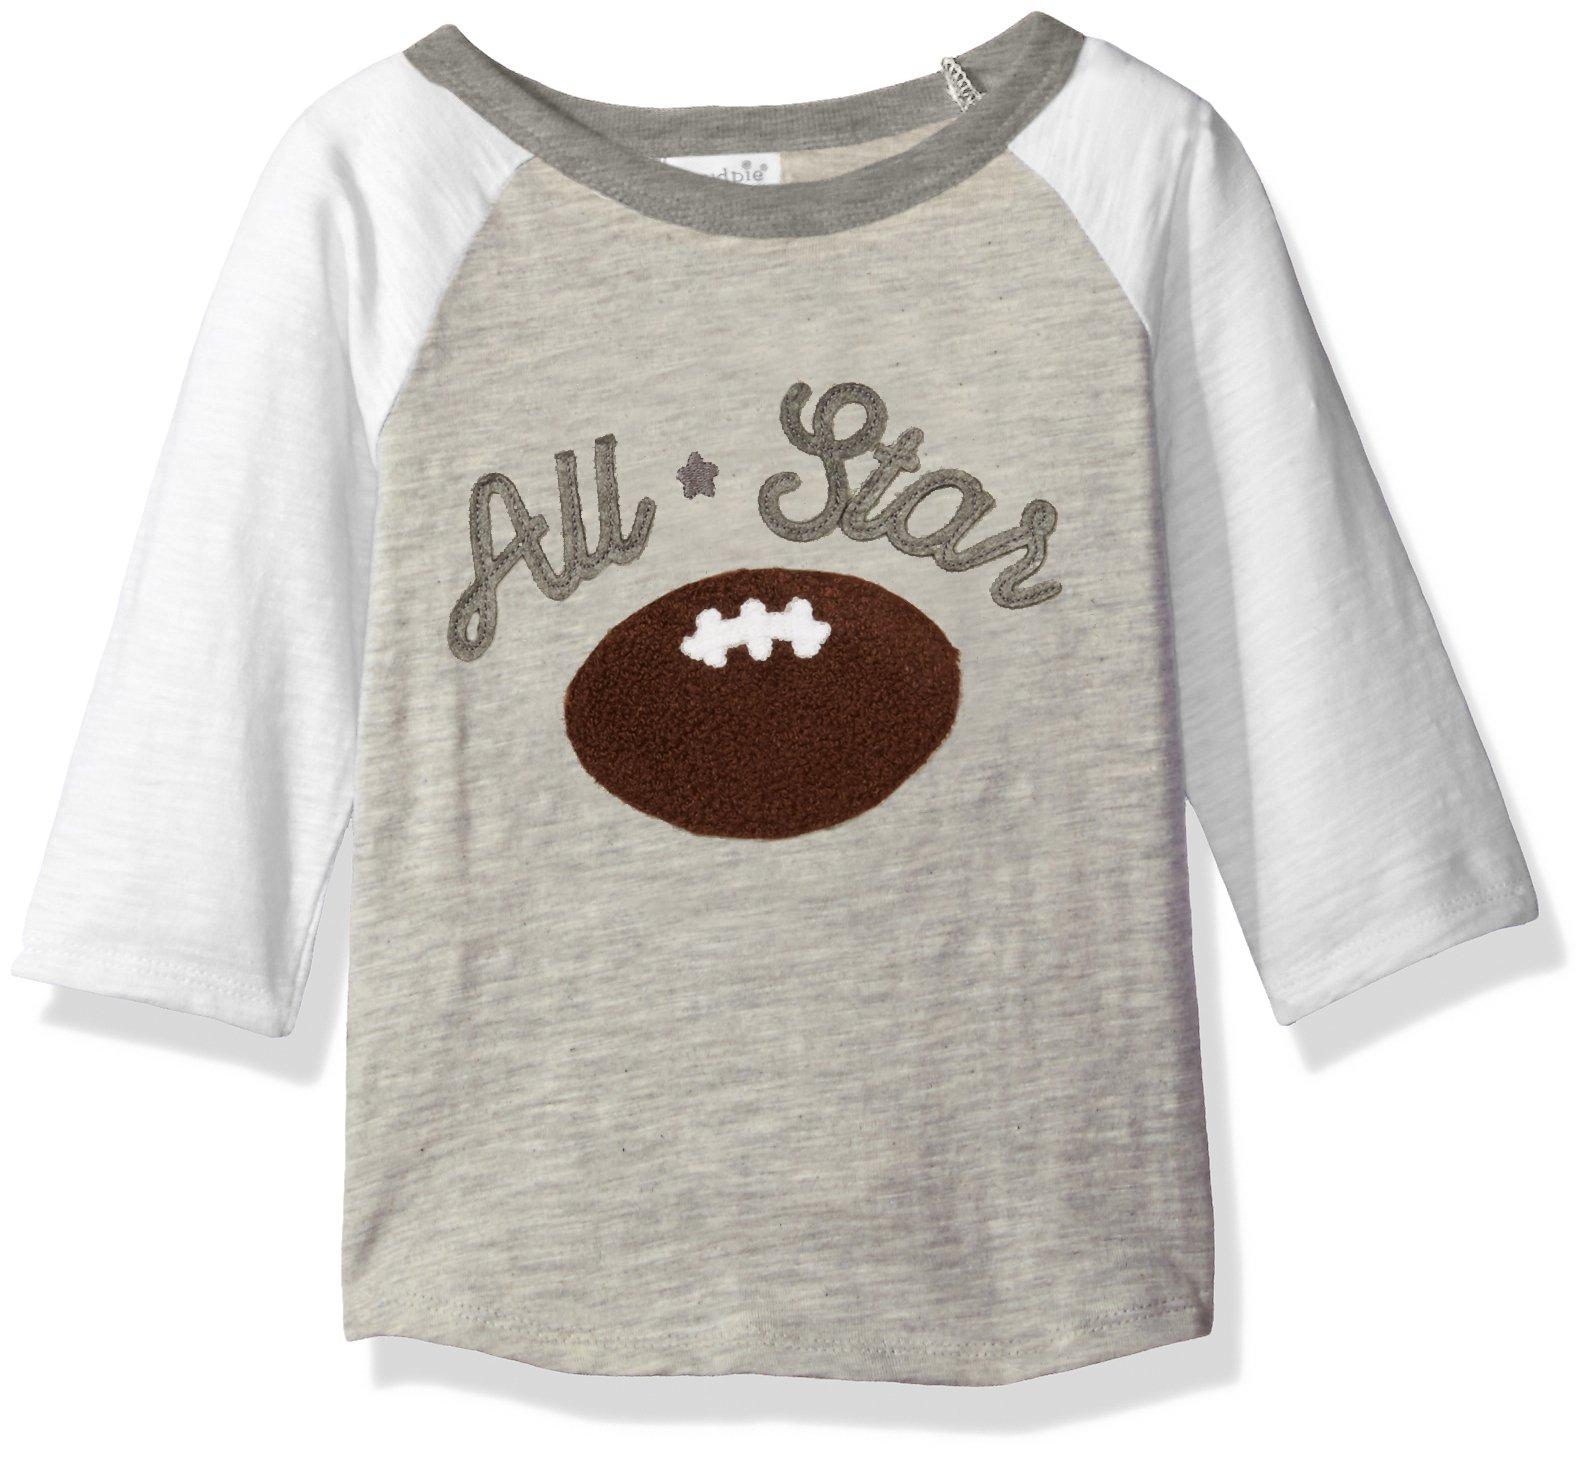 Mud Pie Baby Boys' Raglan T-Shirt, Football, 12-18 Months